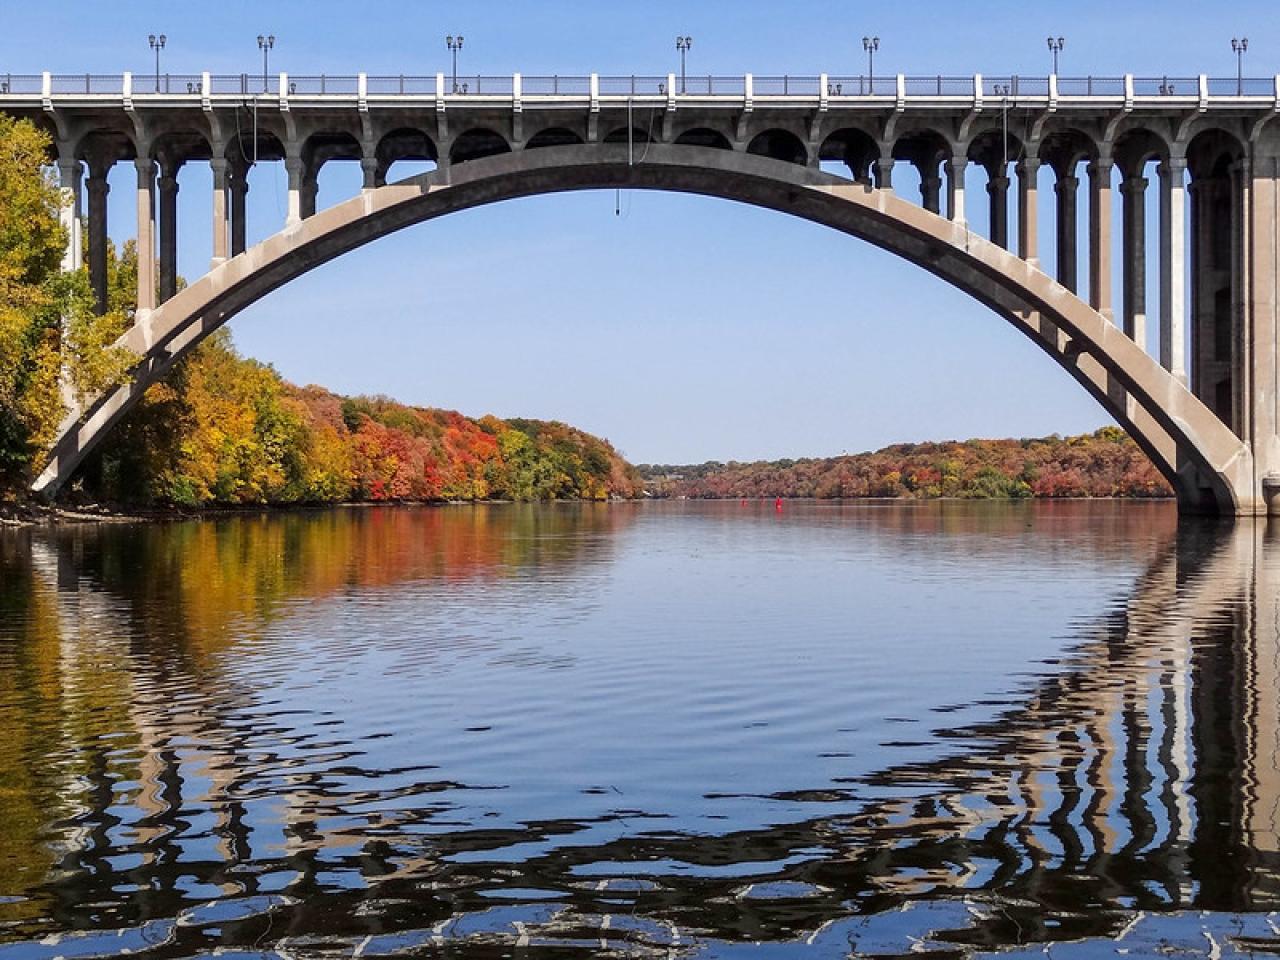 Mississippi River flows below bridge.